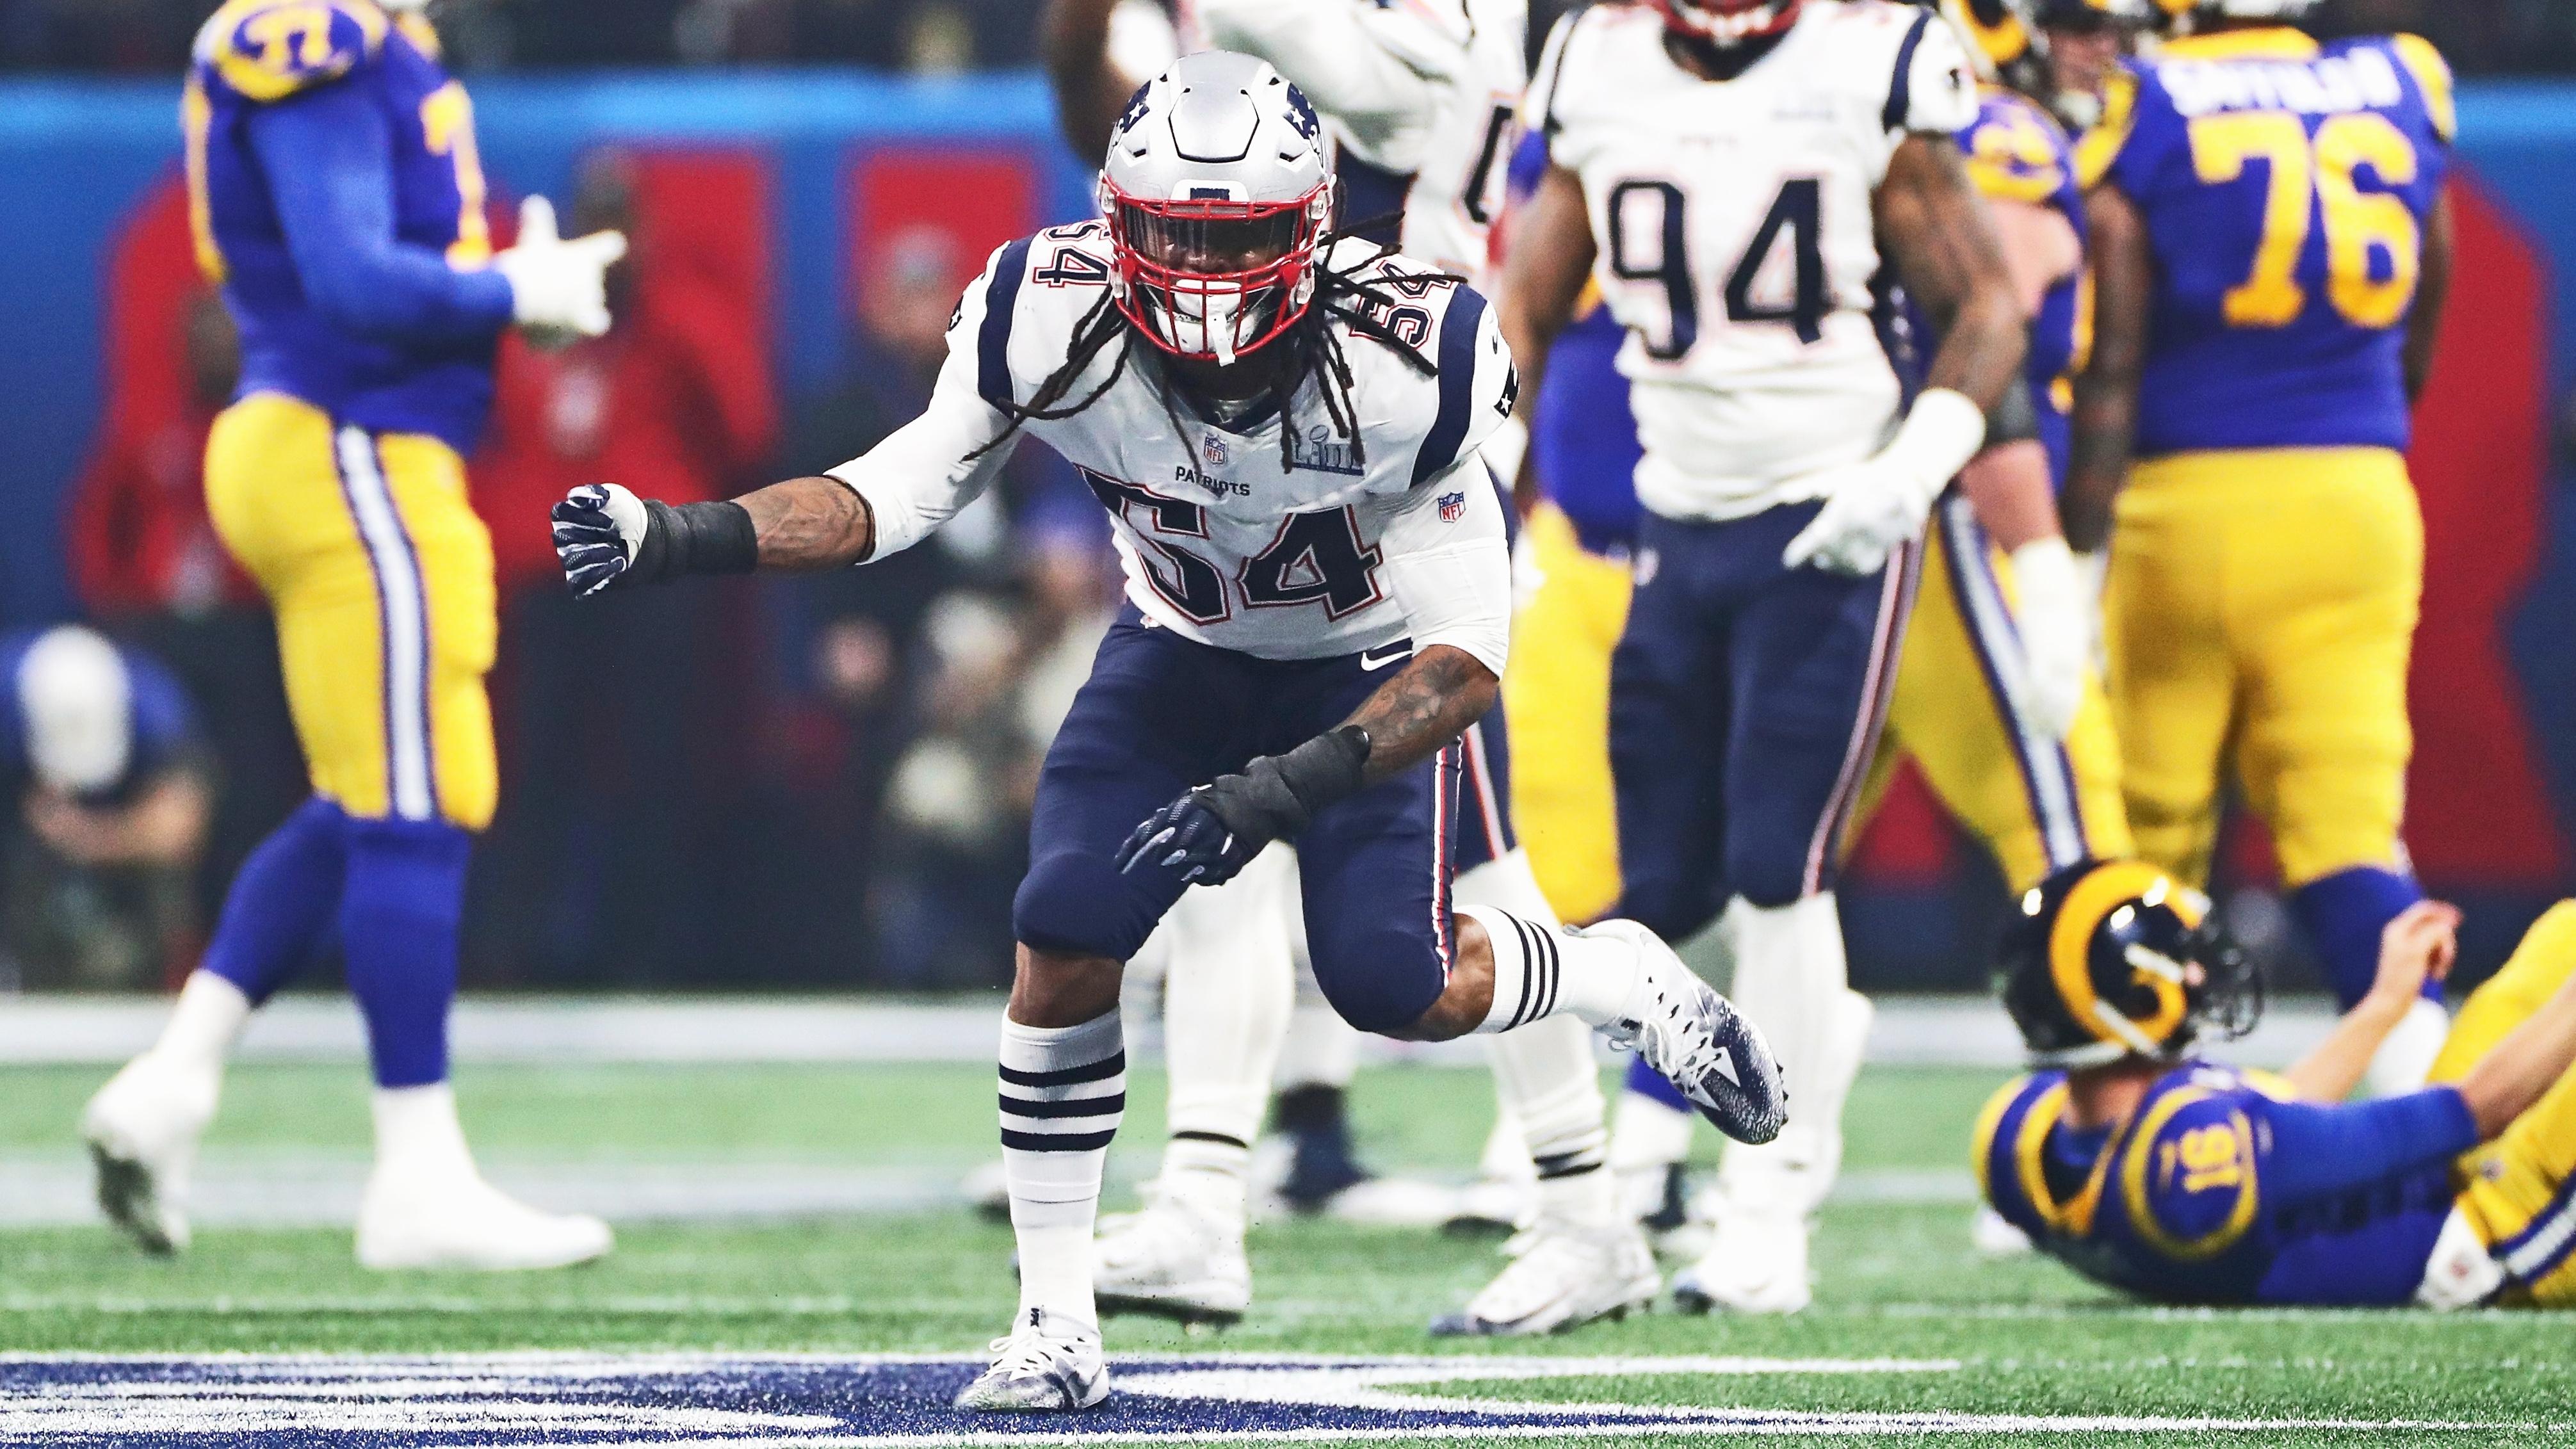 Hightower, Van Noy, Gilmore Can Be Alternate Super Bowl Mvps in Super Bowl Mvp Voting